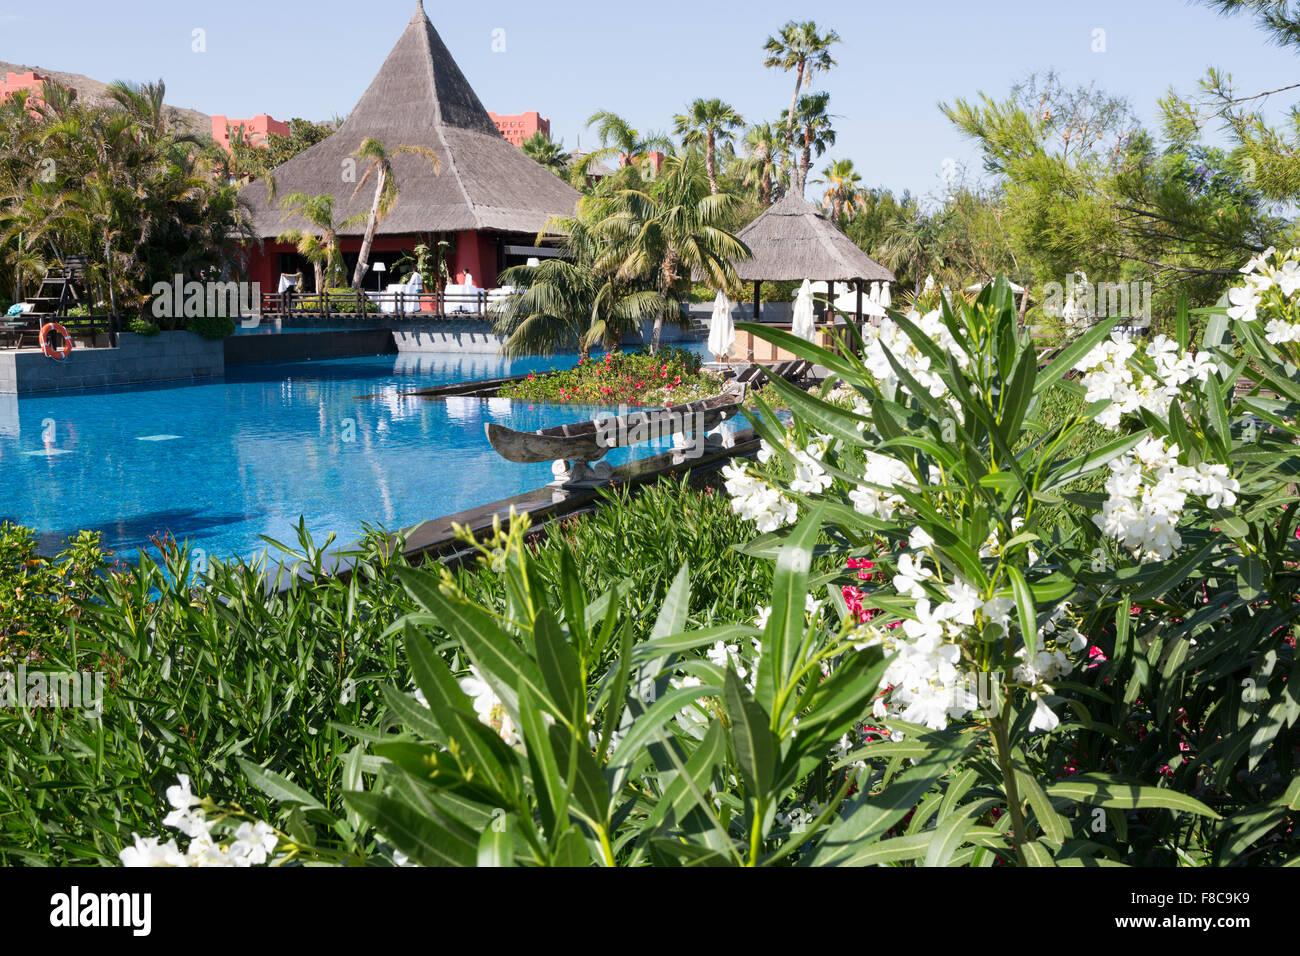 Asia gardens hotel a 5 star hotel near benidorm alicante - Hotel benidorm asia garden ...